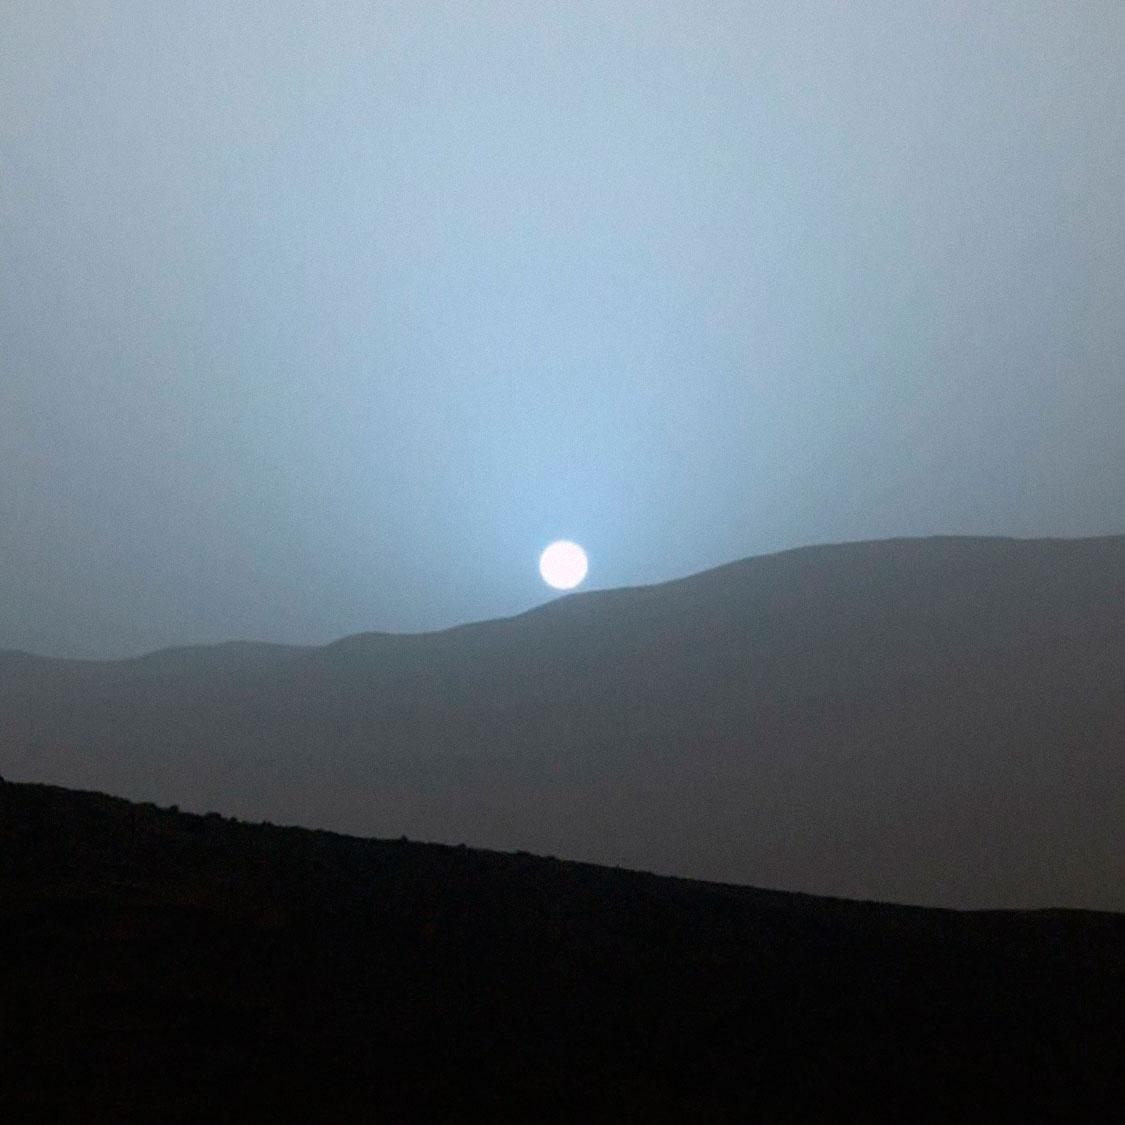 mars-sunset-q